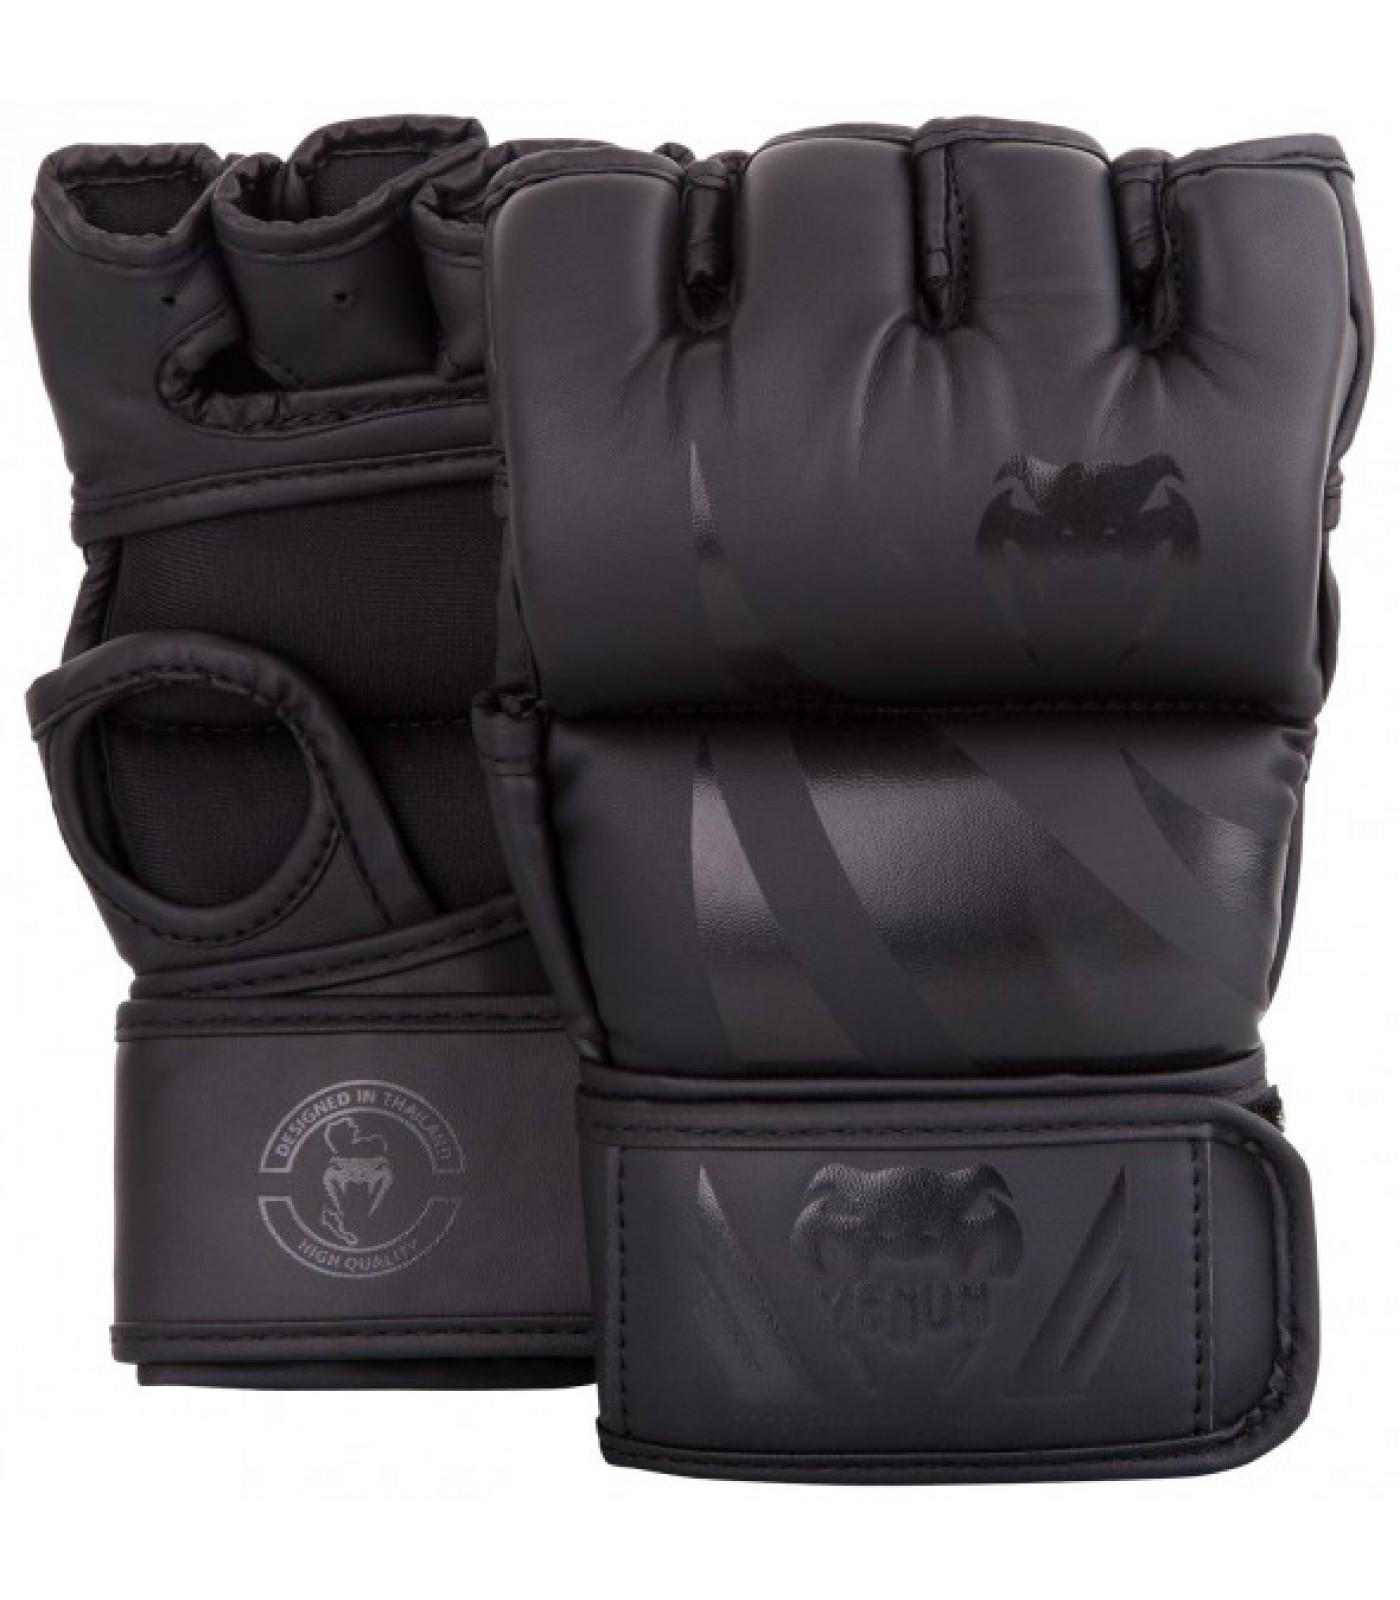 ММА ръкавици без палец - Venum Challenger MMA Gloves - Without Thumb - Black/Black